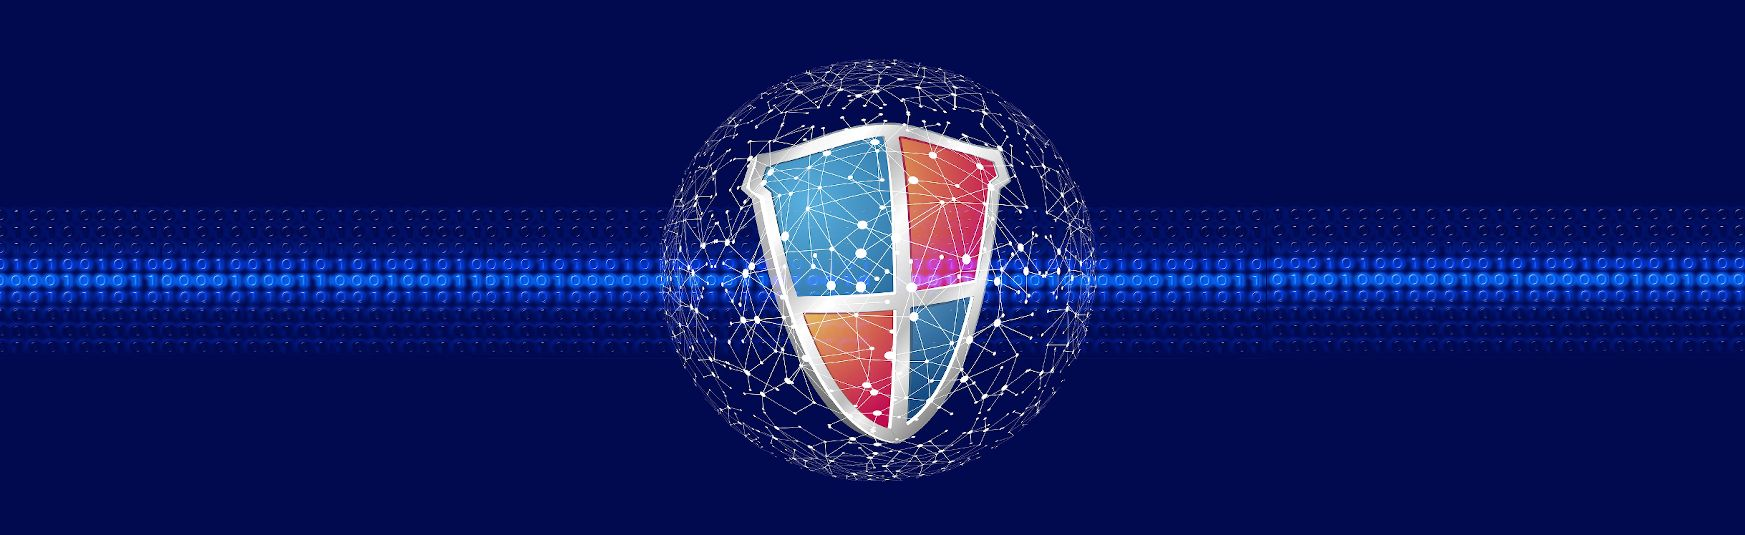 Datenschutz, externe Datenschutzbeauftragte